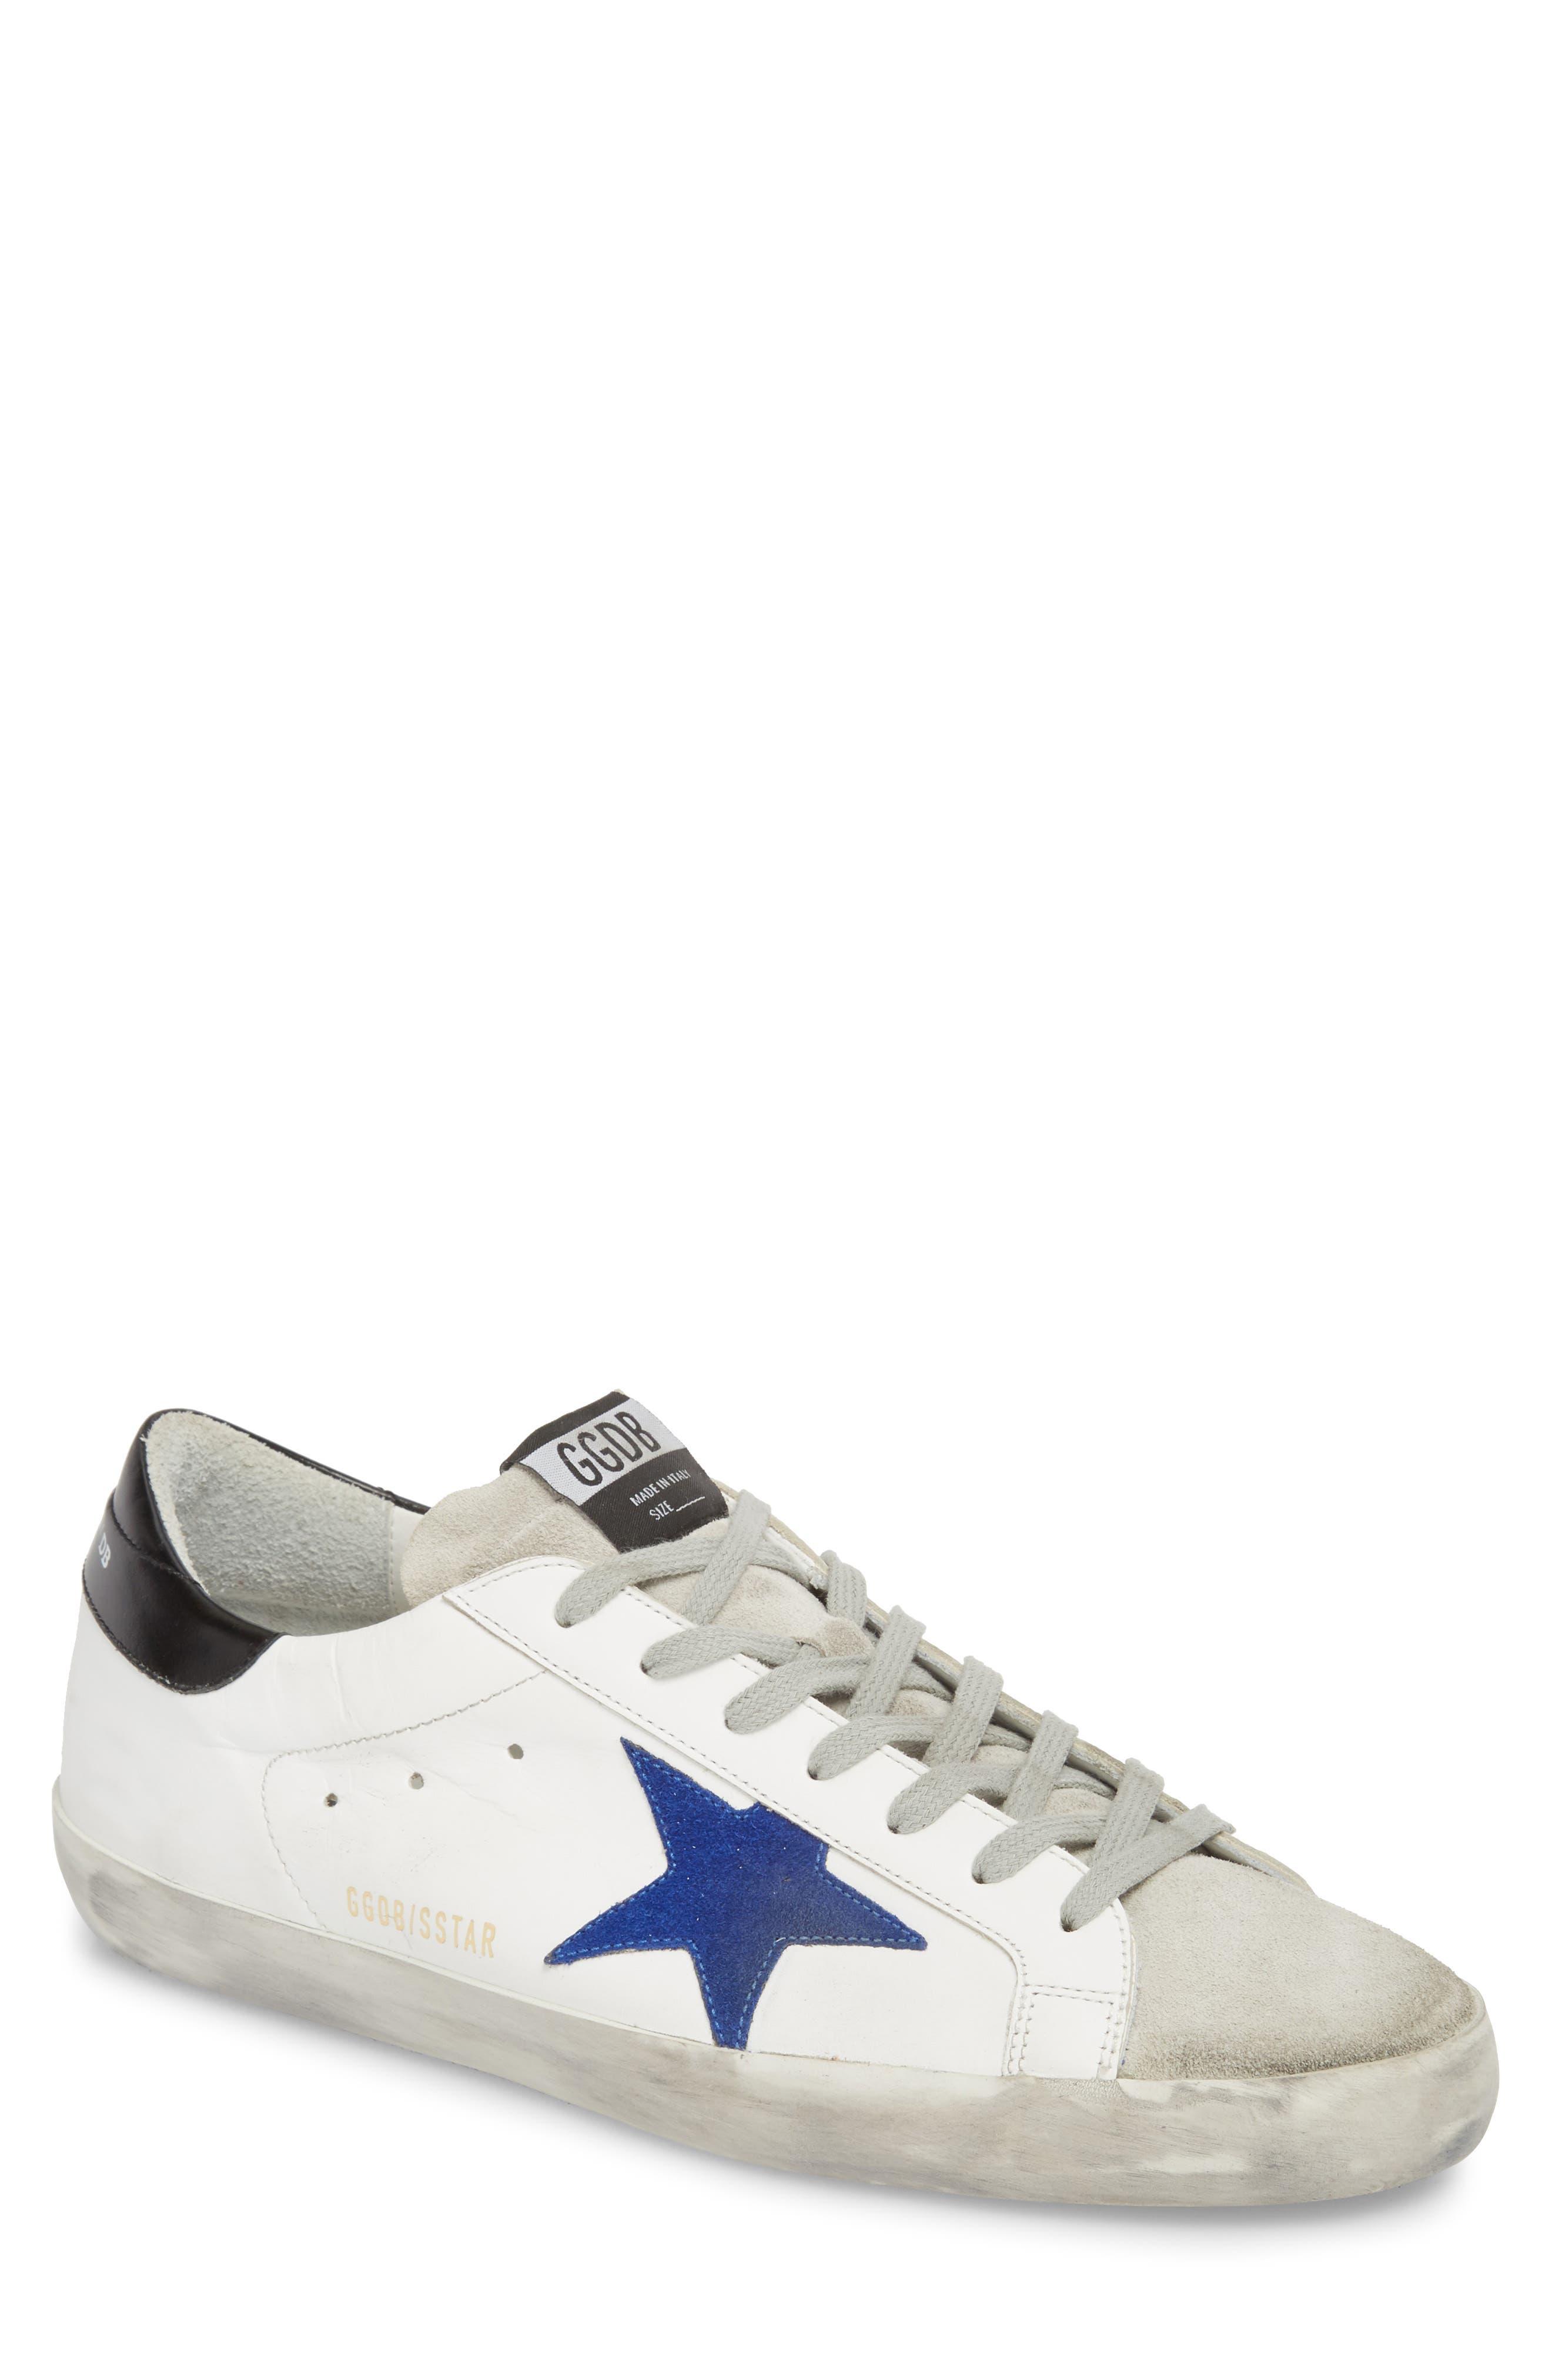 'Superstar' Sneaker,                         Main,                         color, WHITE-BLUE-BLACK